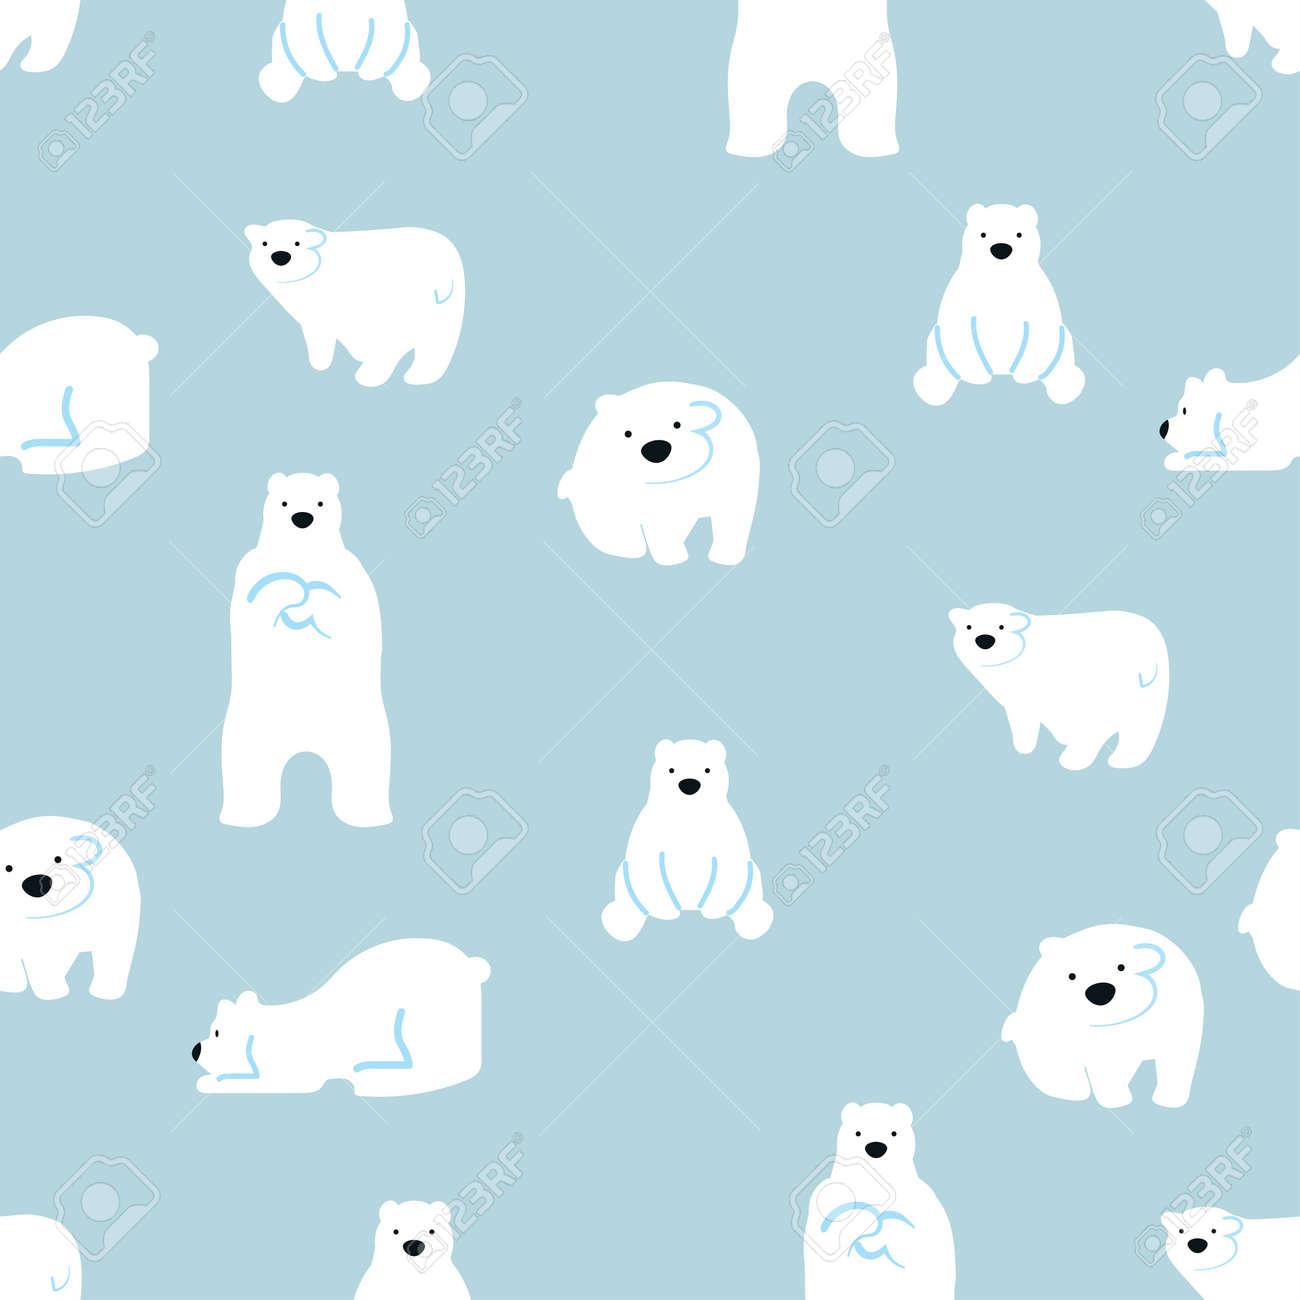 cute polar bears seamless pattern background - 168920548